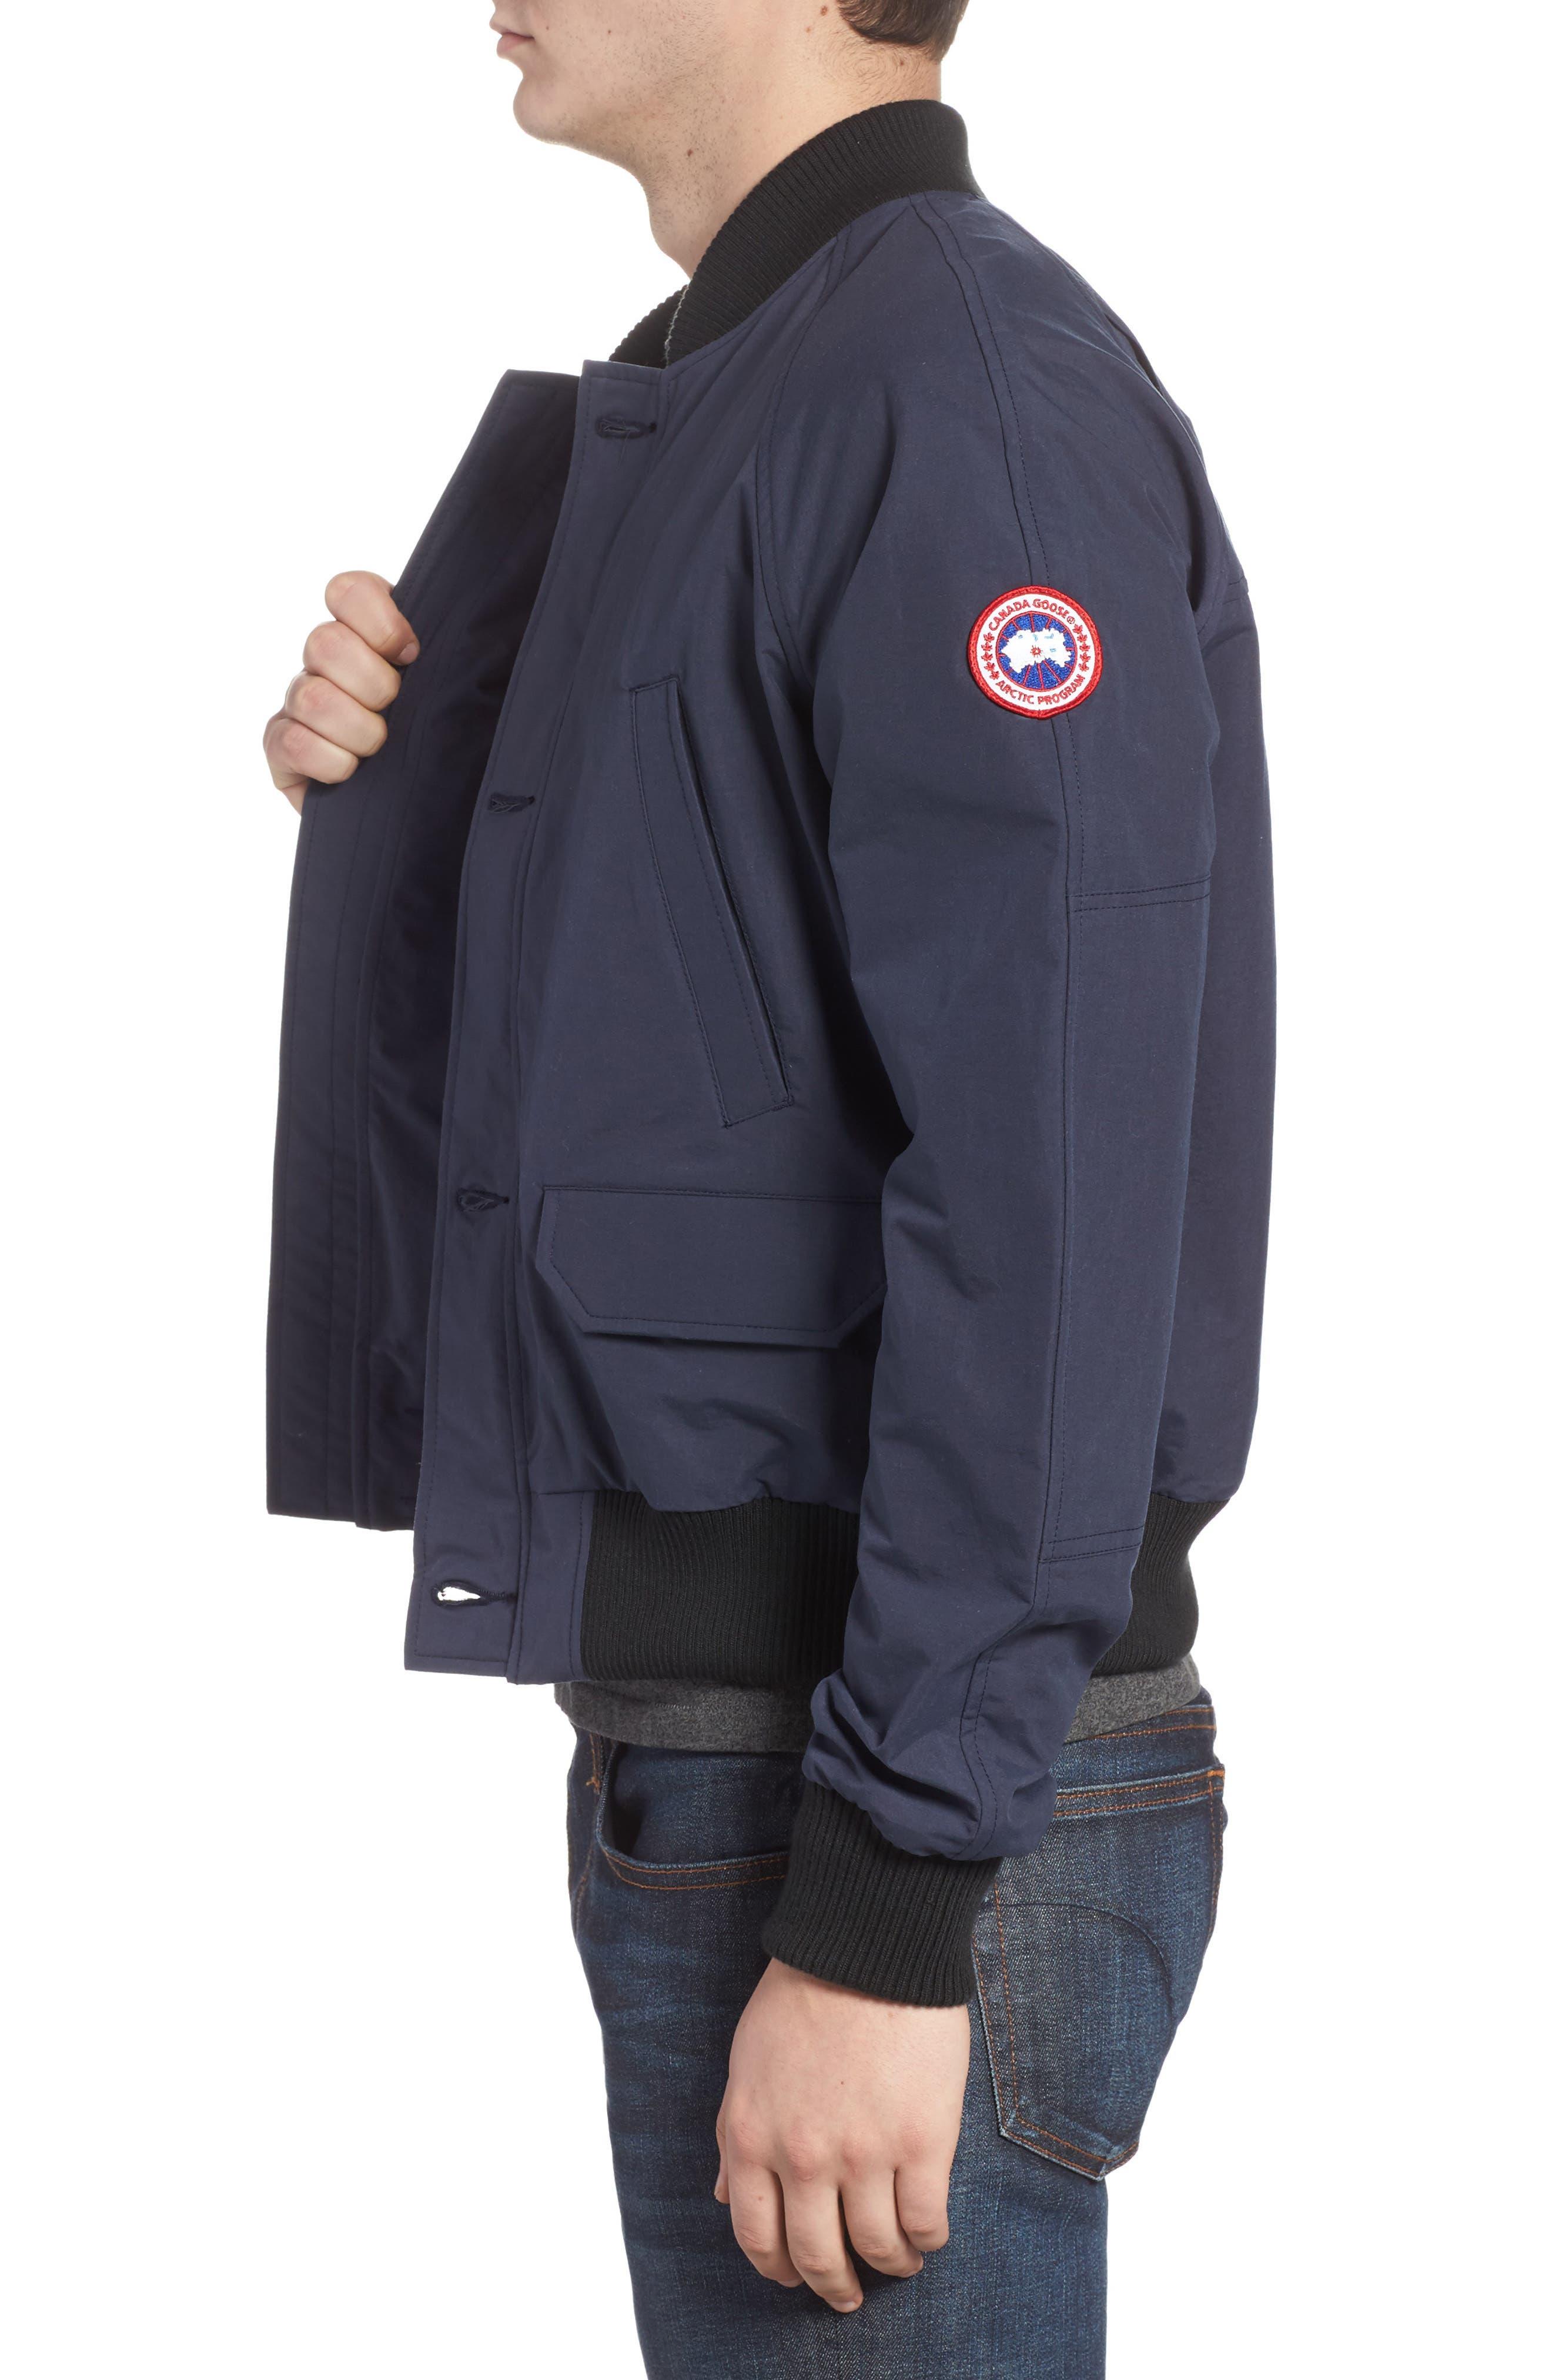 CANADA GOOSE, Faber Slim Fit Bomber Jacket, Alternate thumbnail 3, color, 400